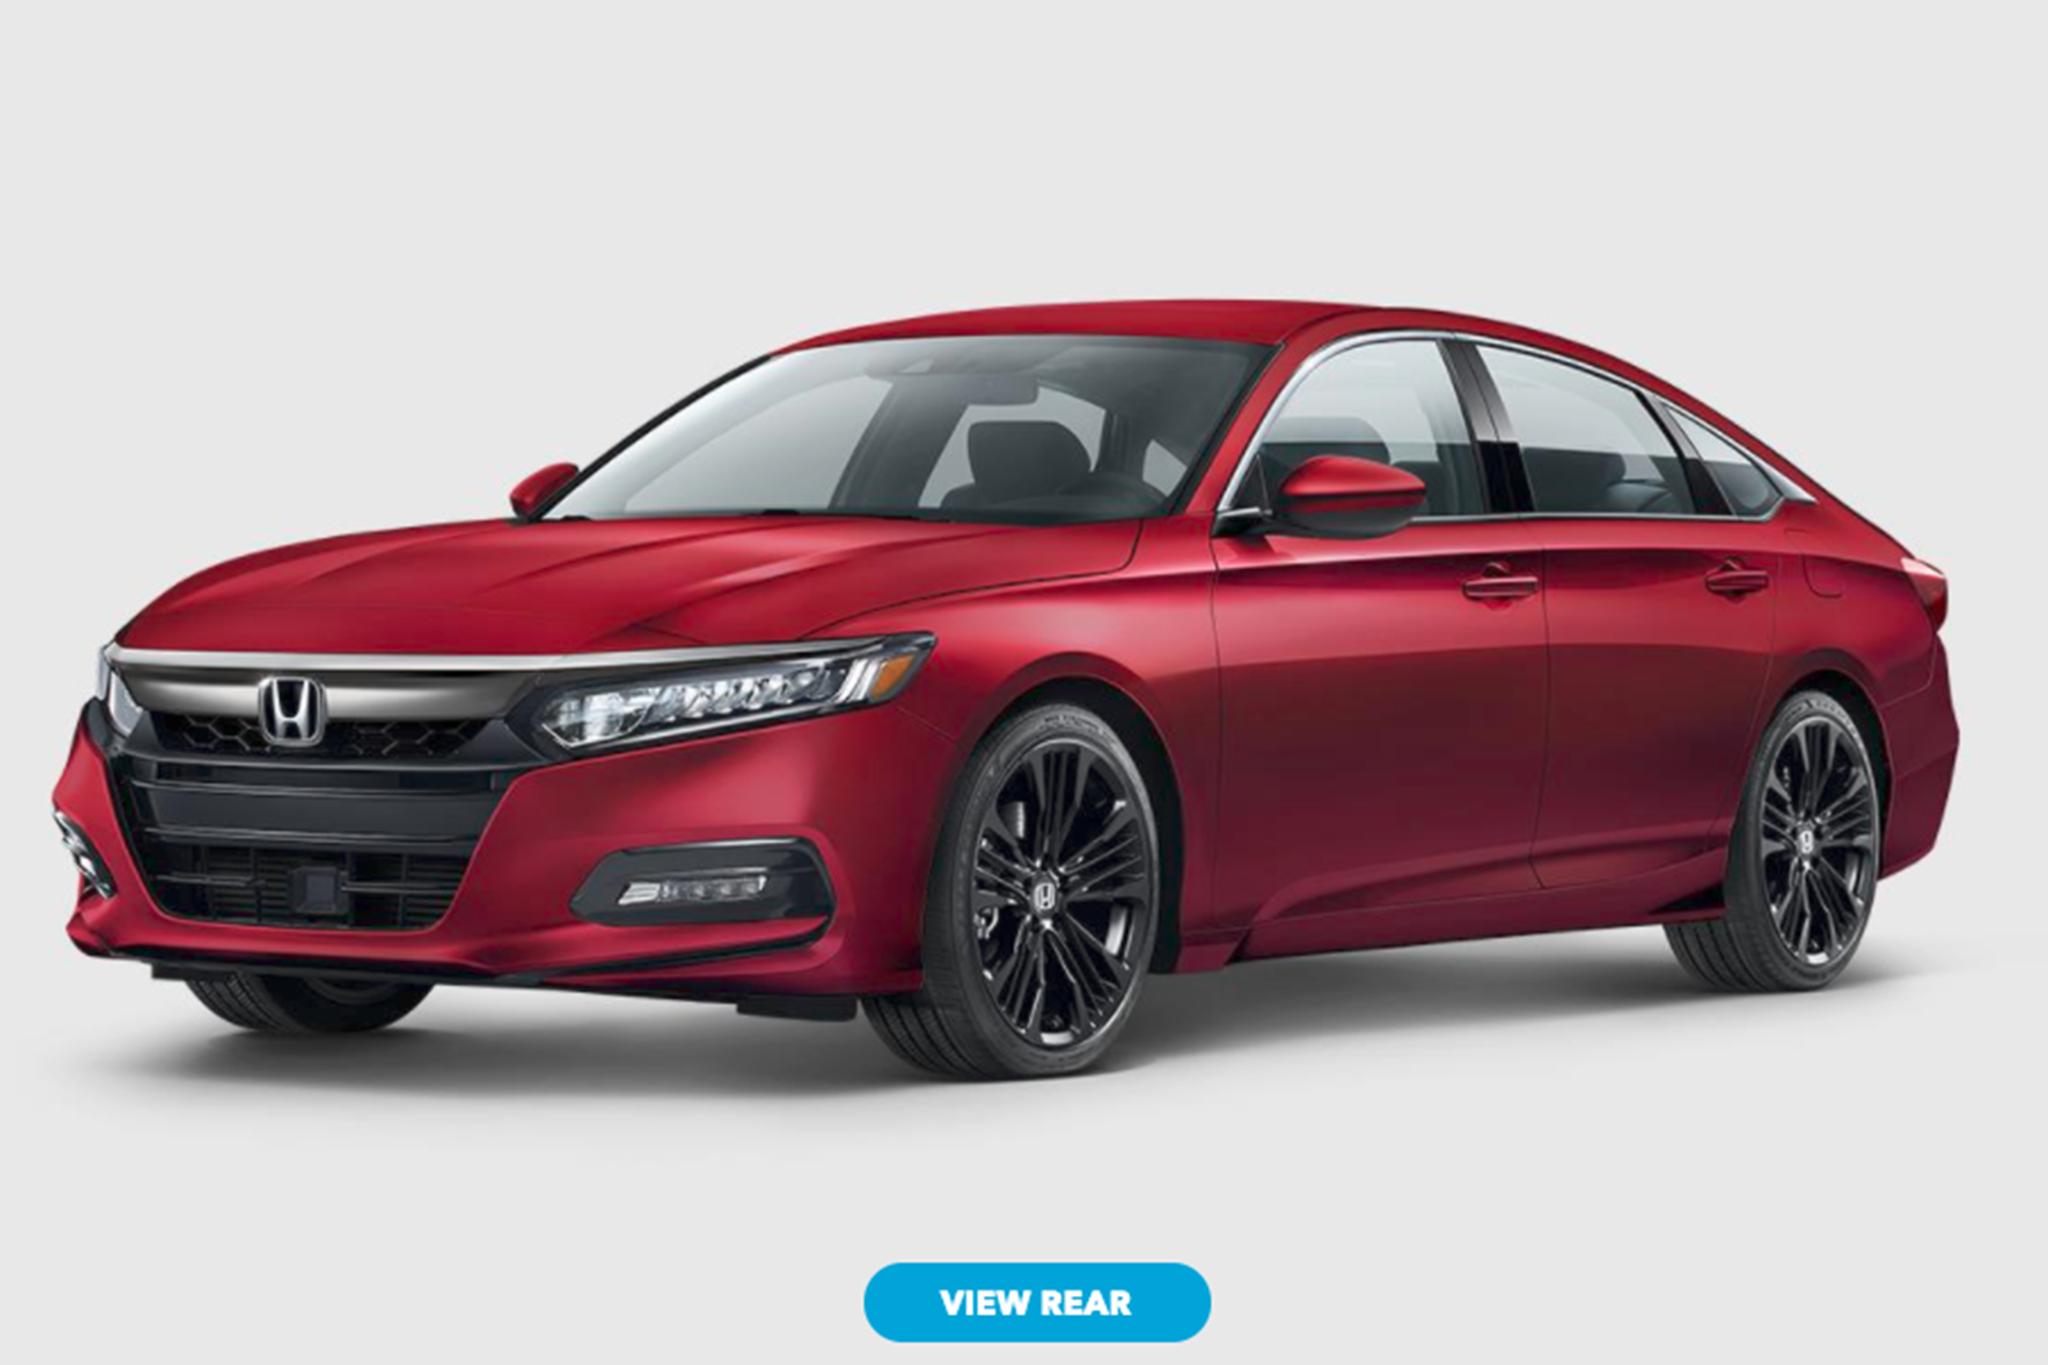 2018 Honda Accord Black >> 2018 Honda Accord Configurator is Live | Automobile Magazine